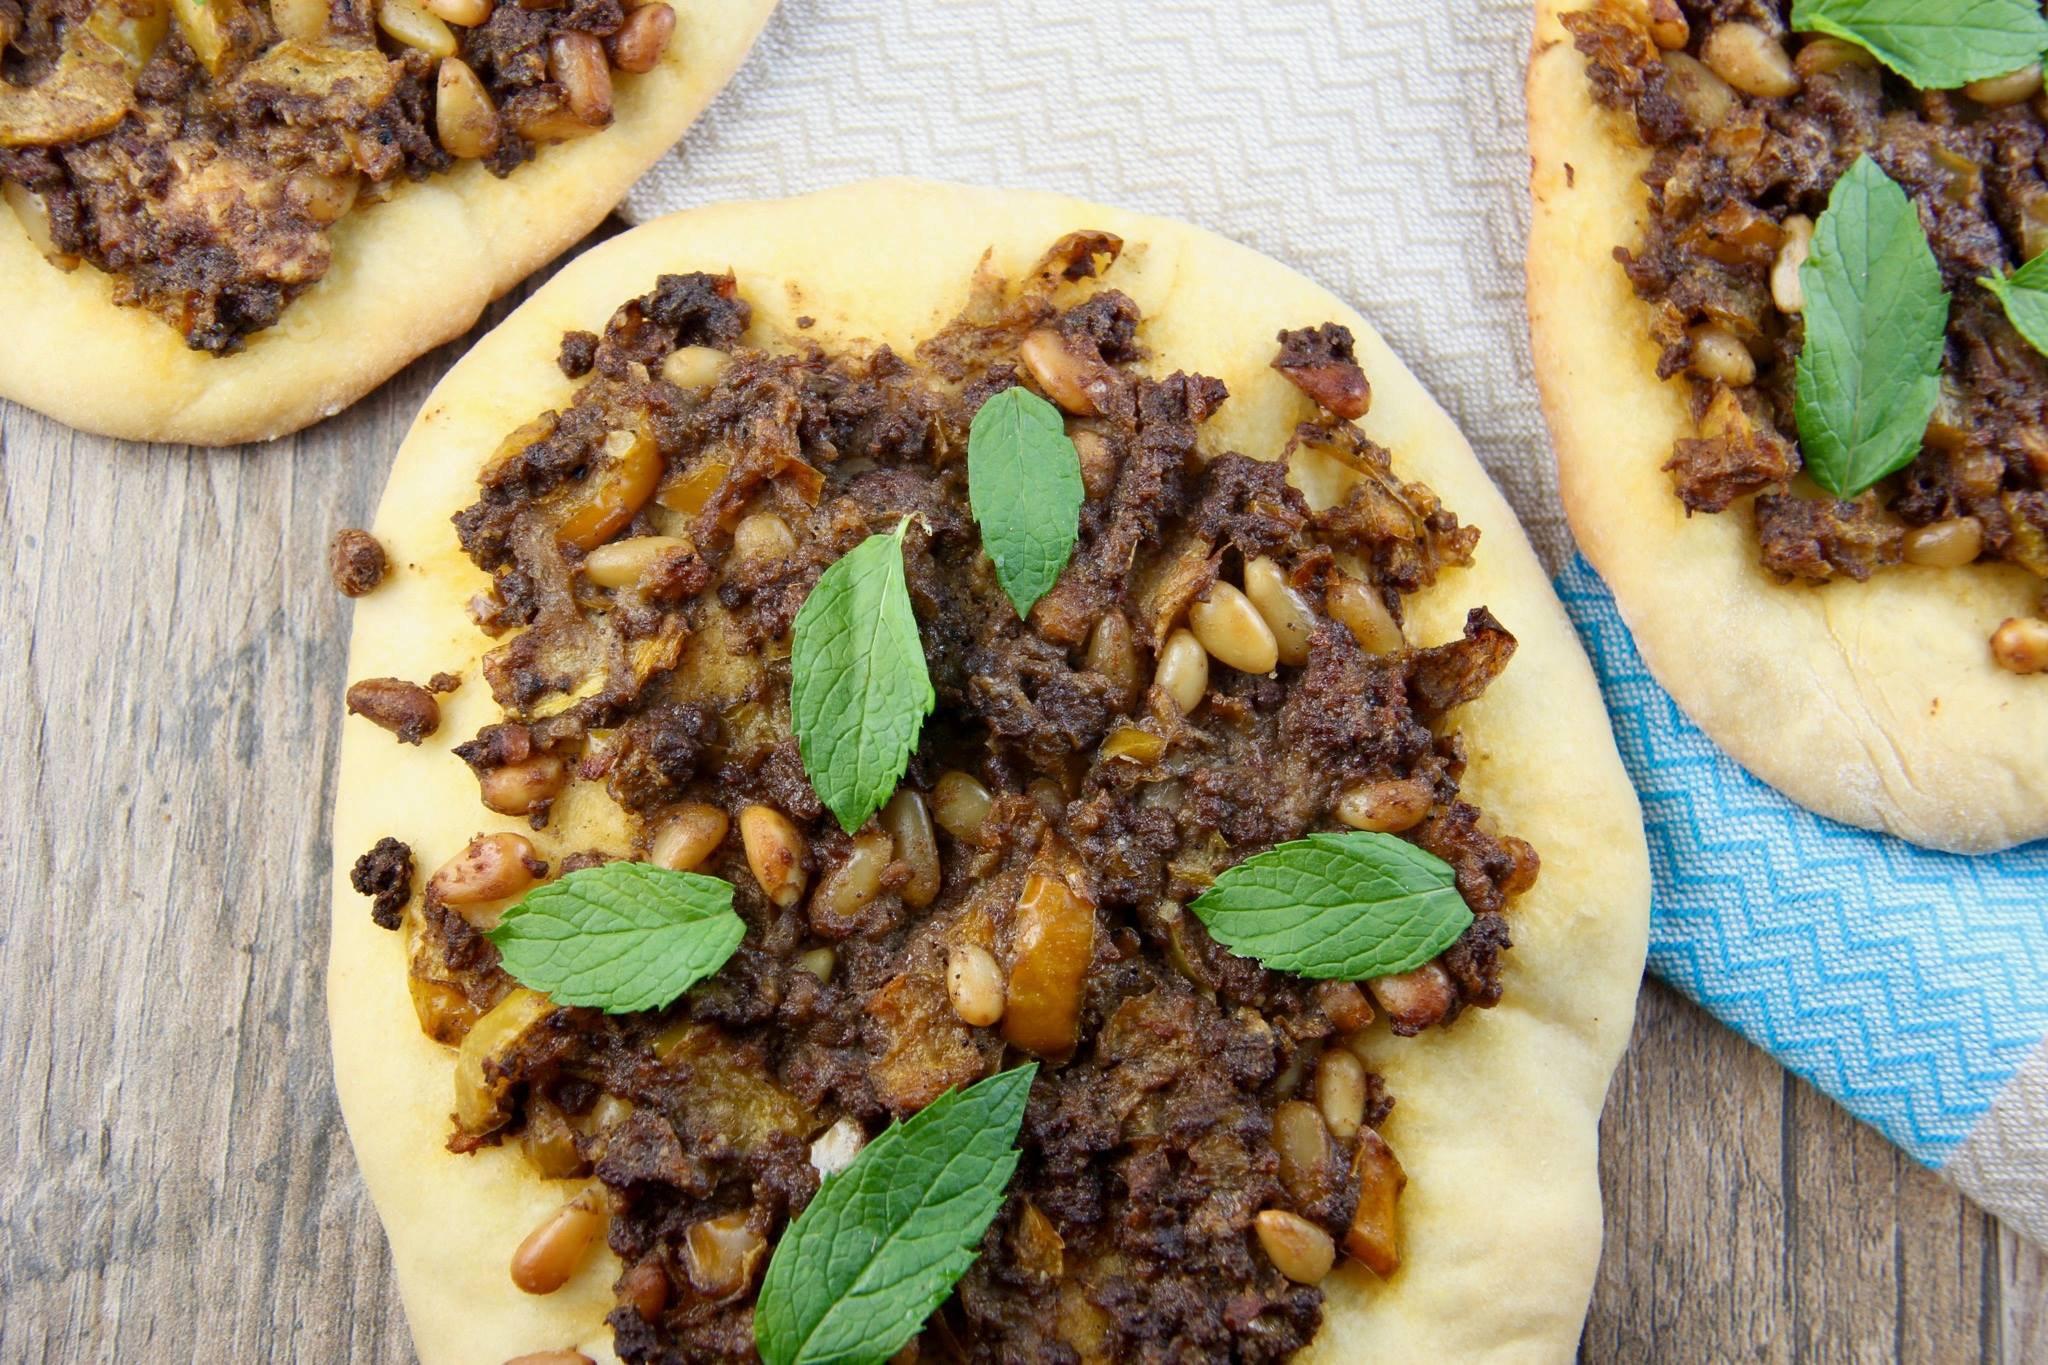 Mediterranean Diet Recipes: Lahmajun